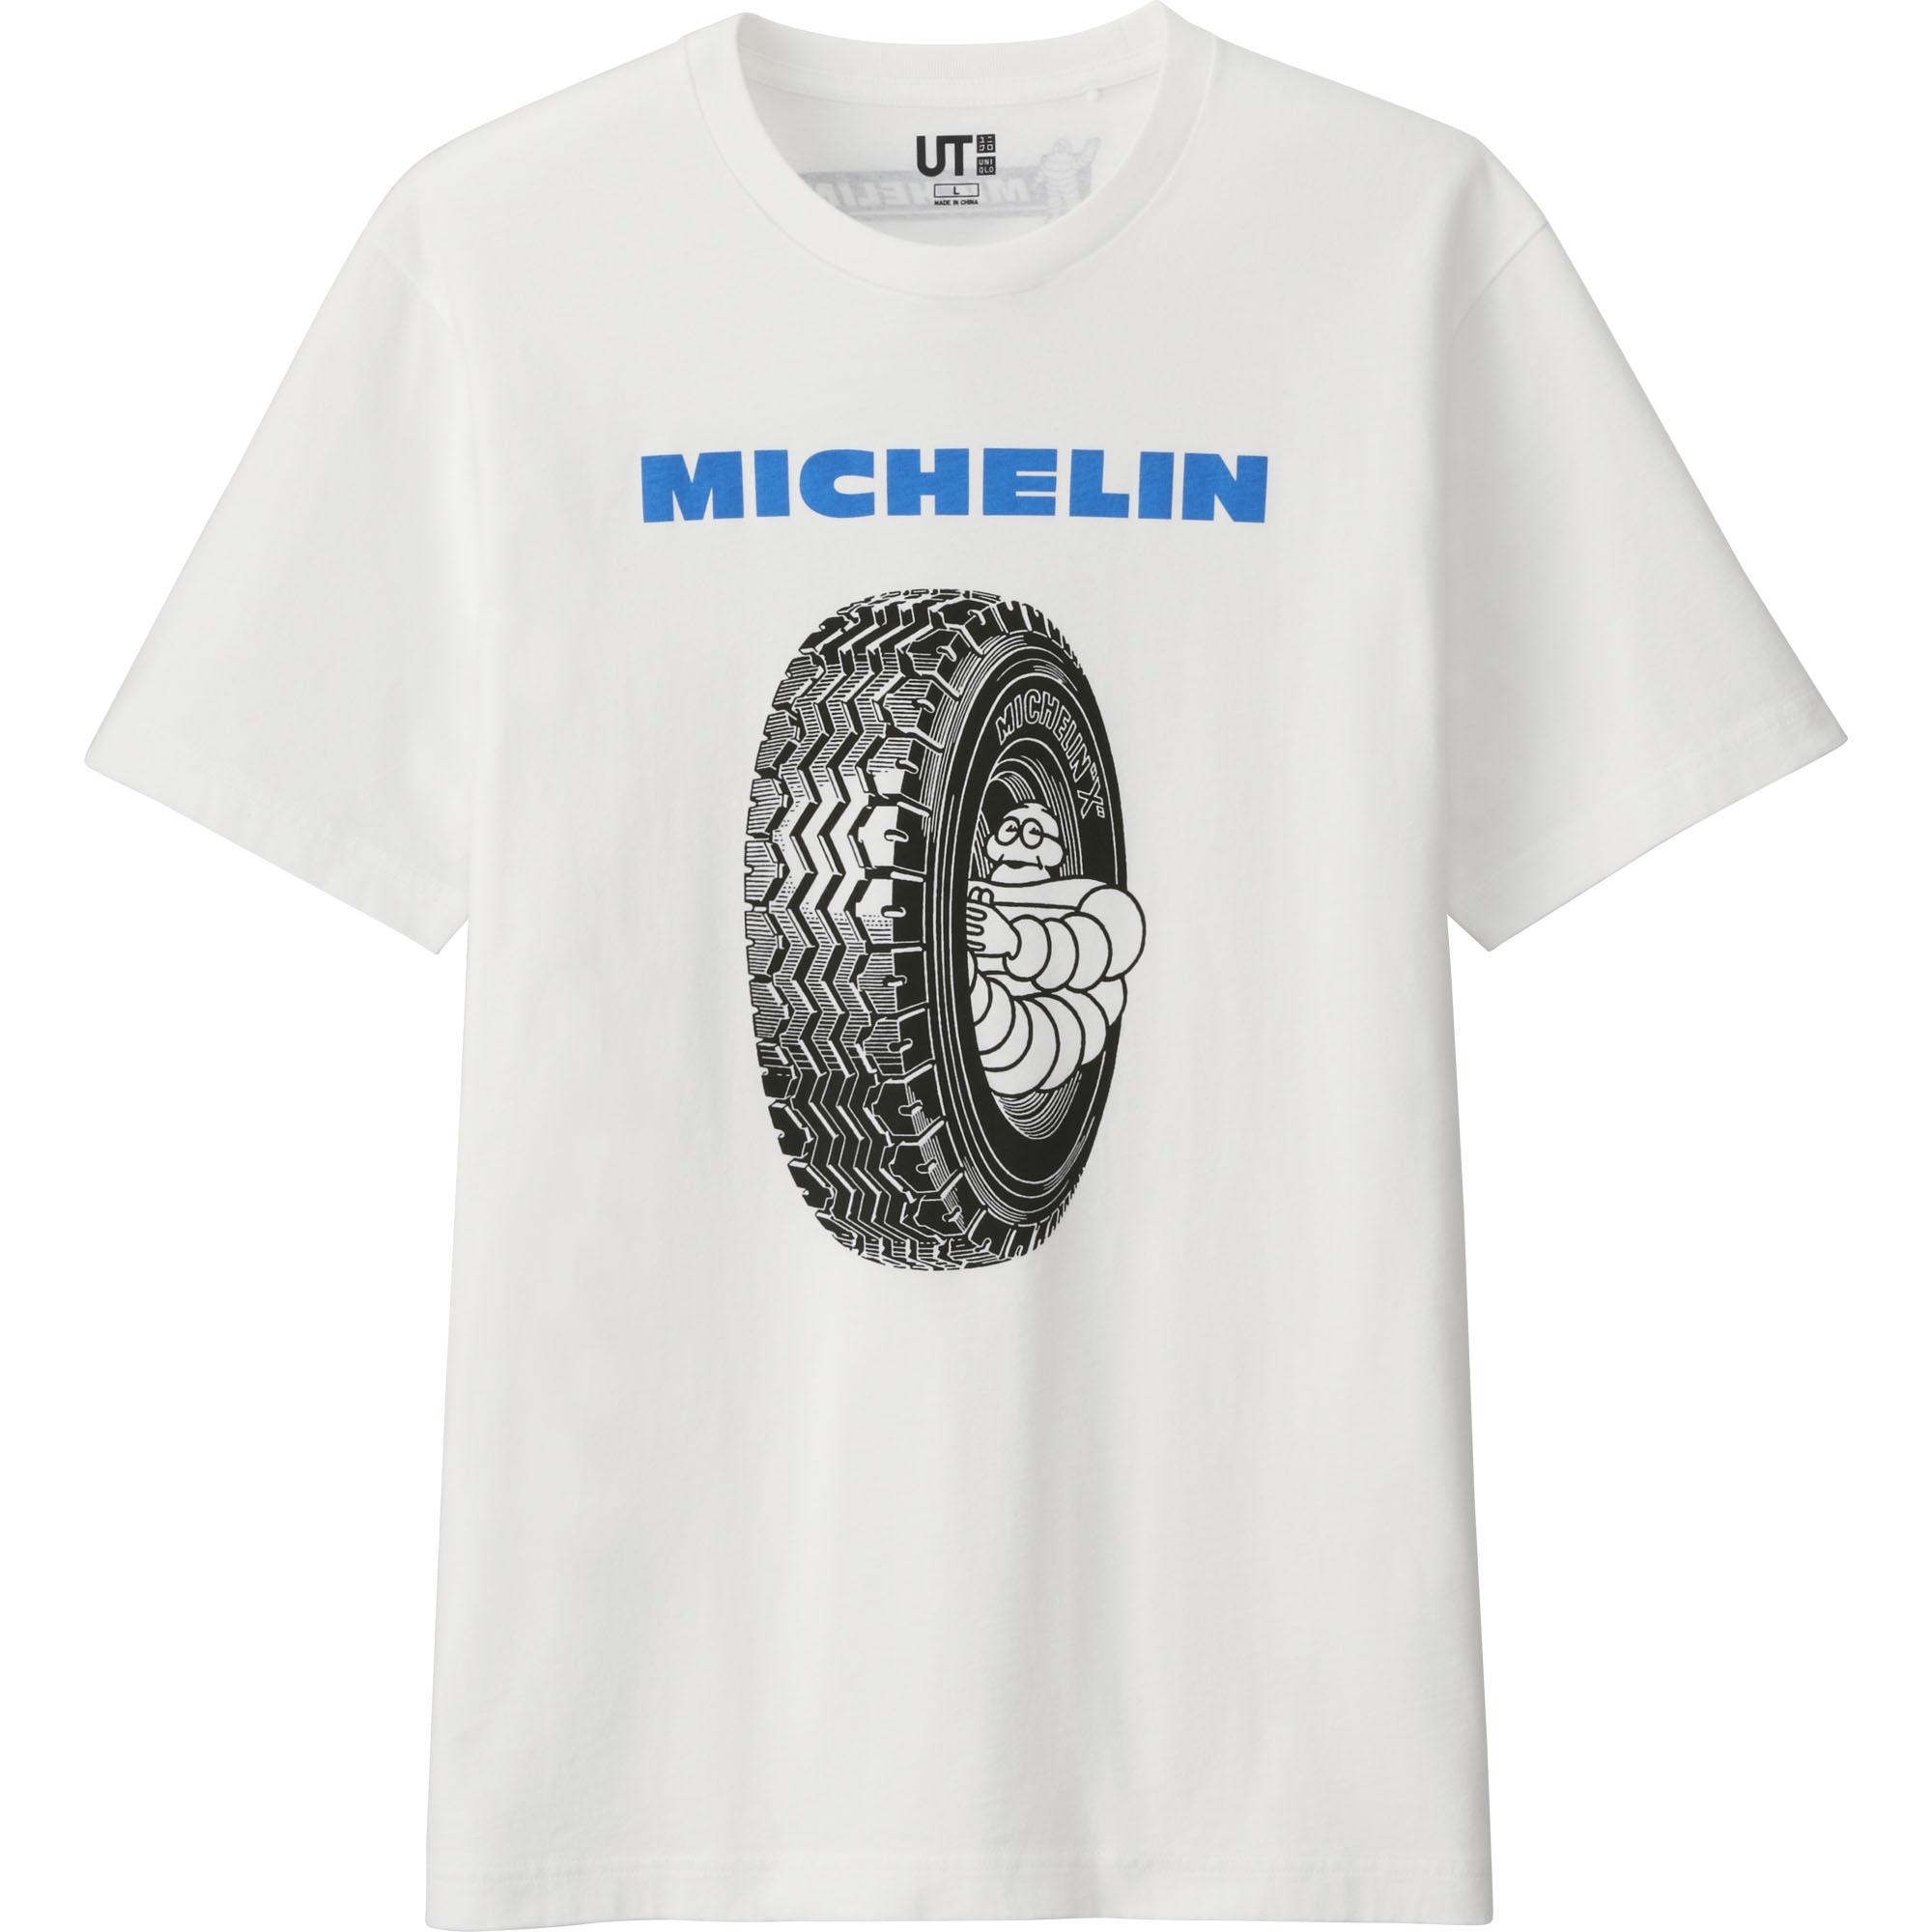 Uniqlo_T-shirt_3